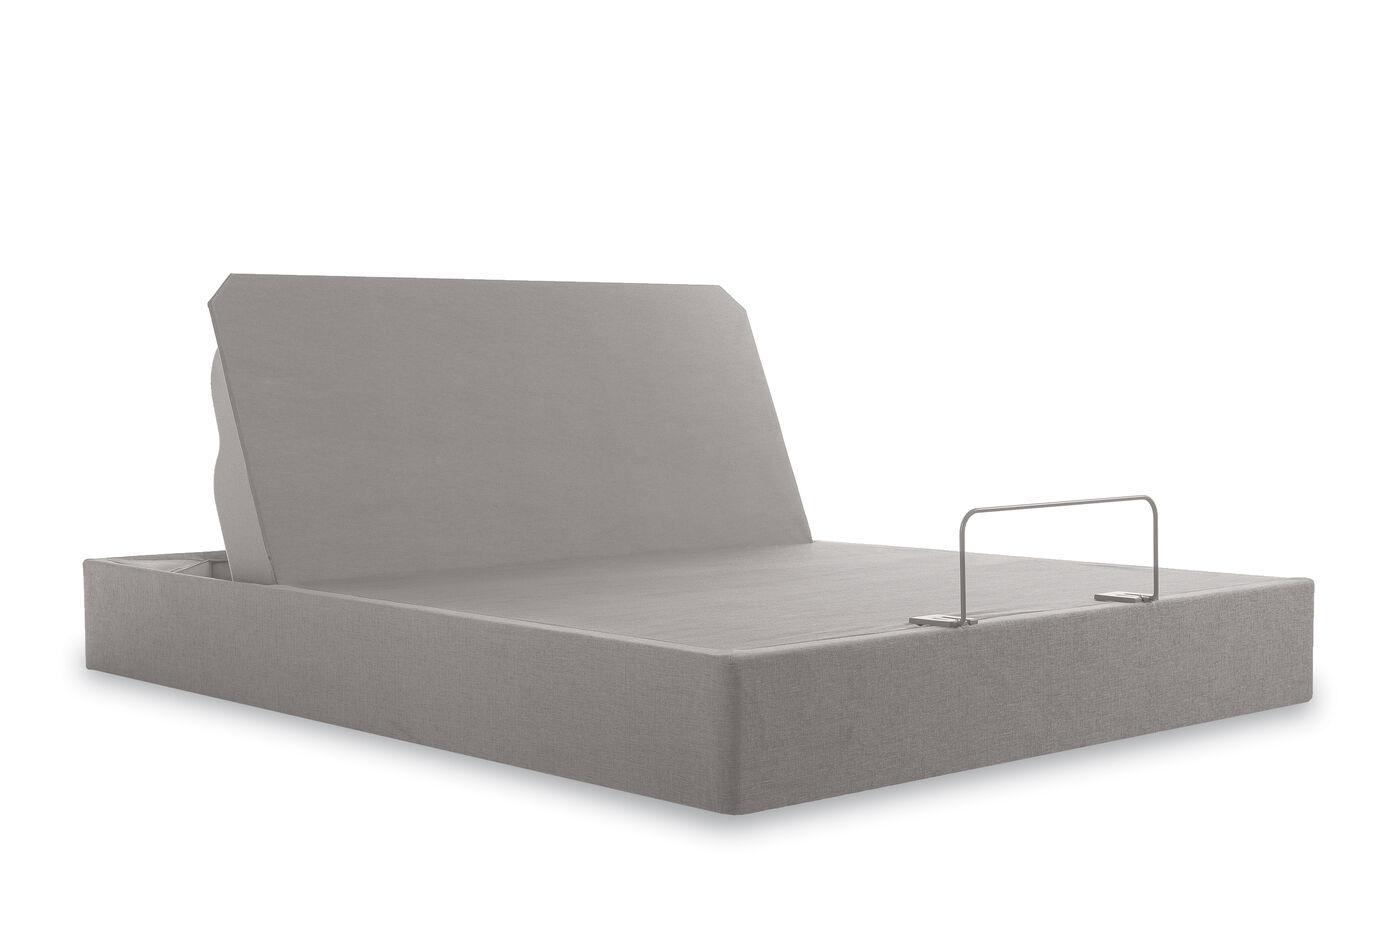 your aetherair comfy sheets split pedic asli king sheet tempur co design sale supreme for contour headboard bedroom tempurpedic reviews